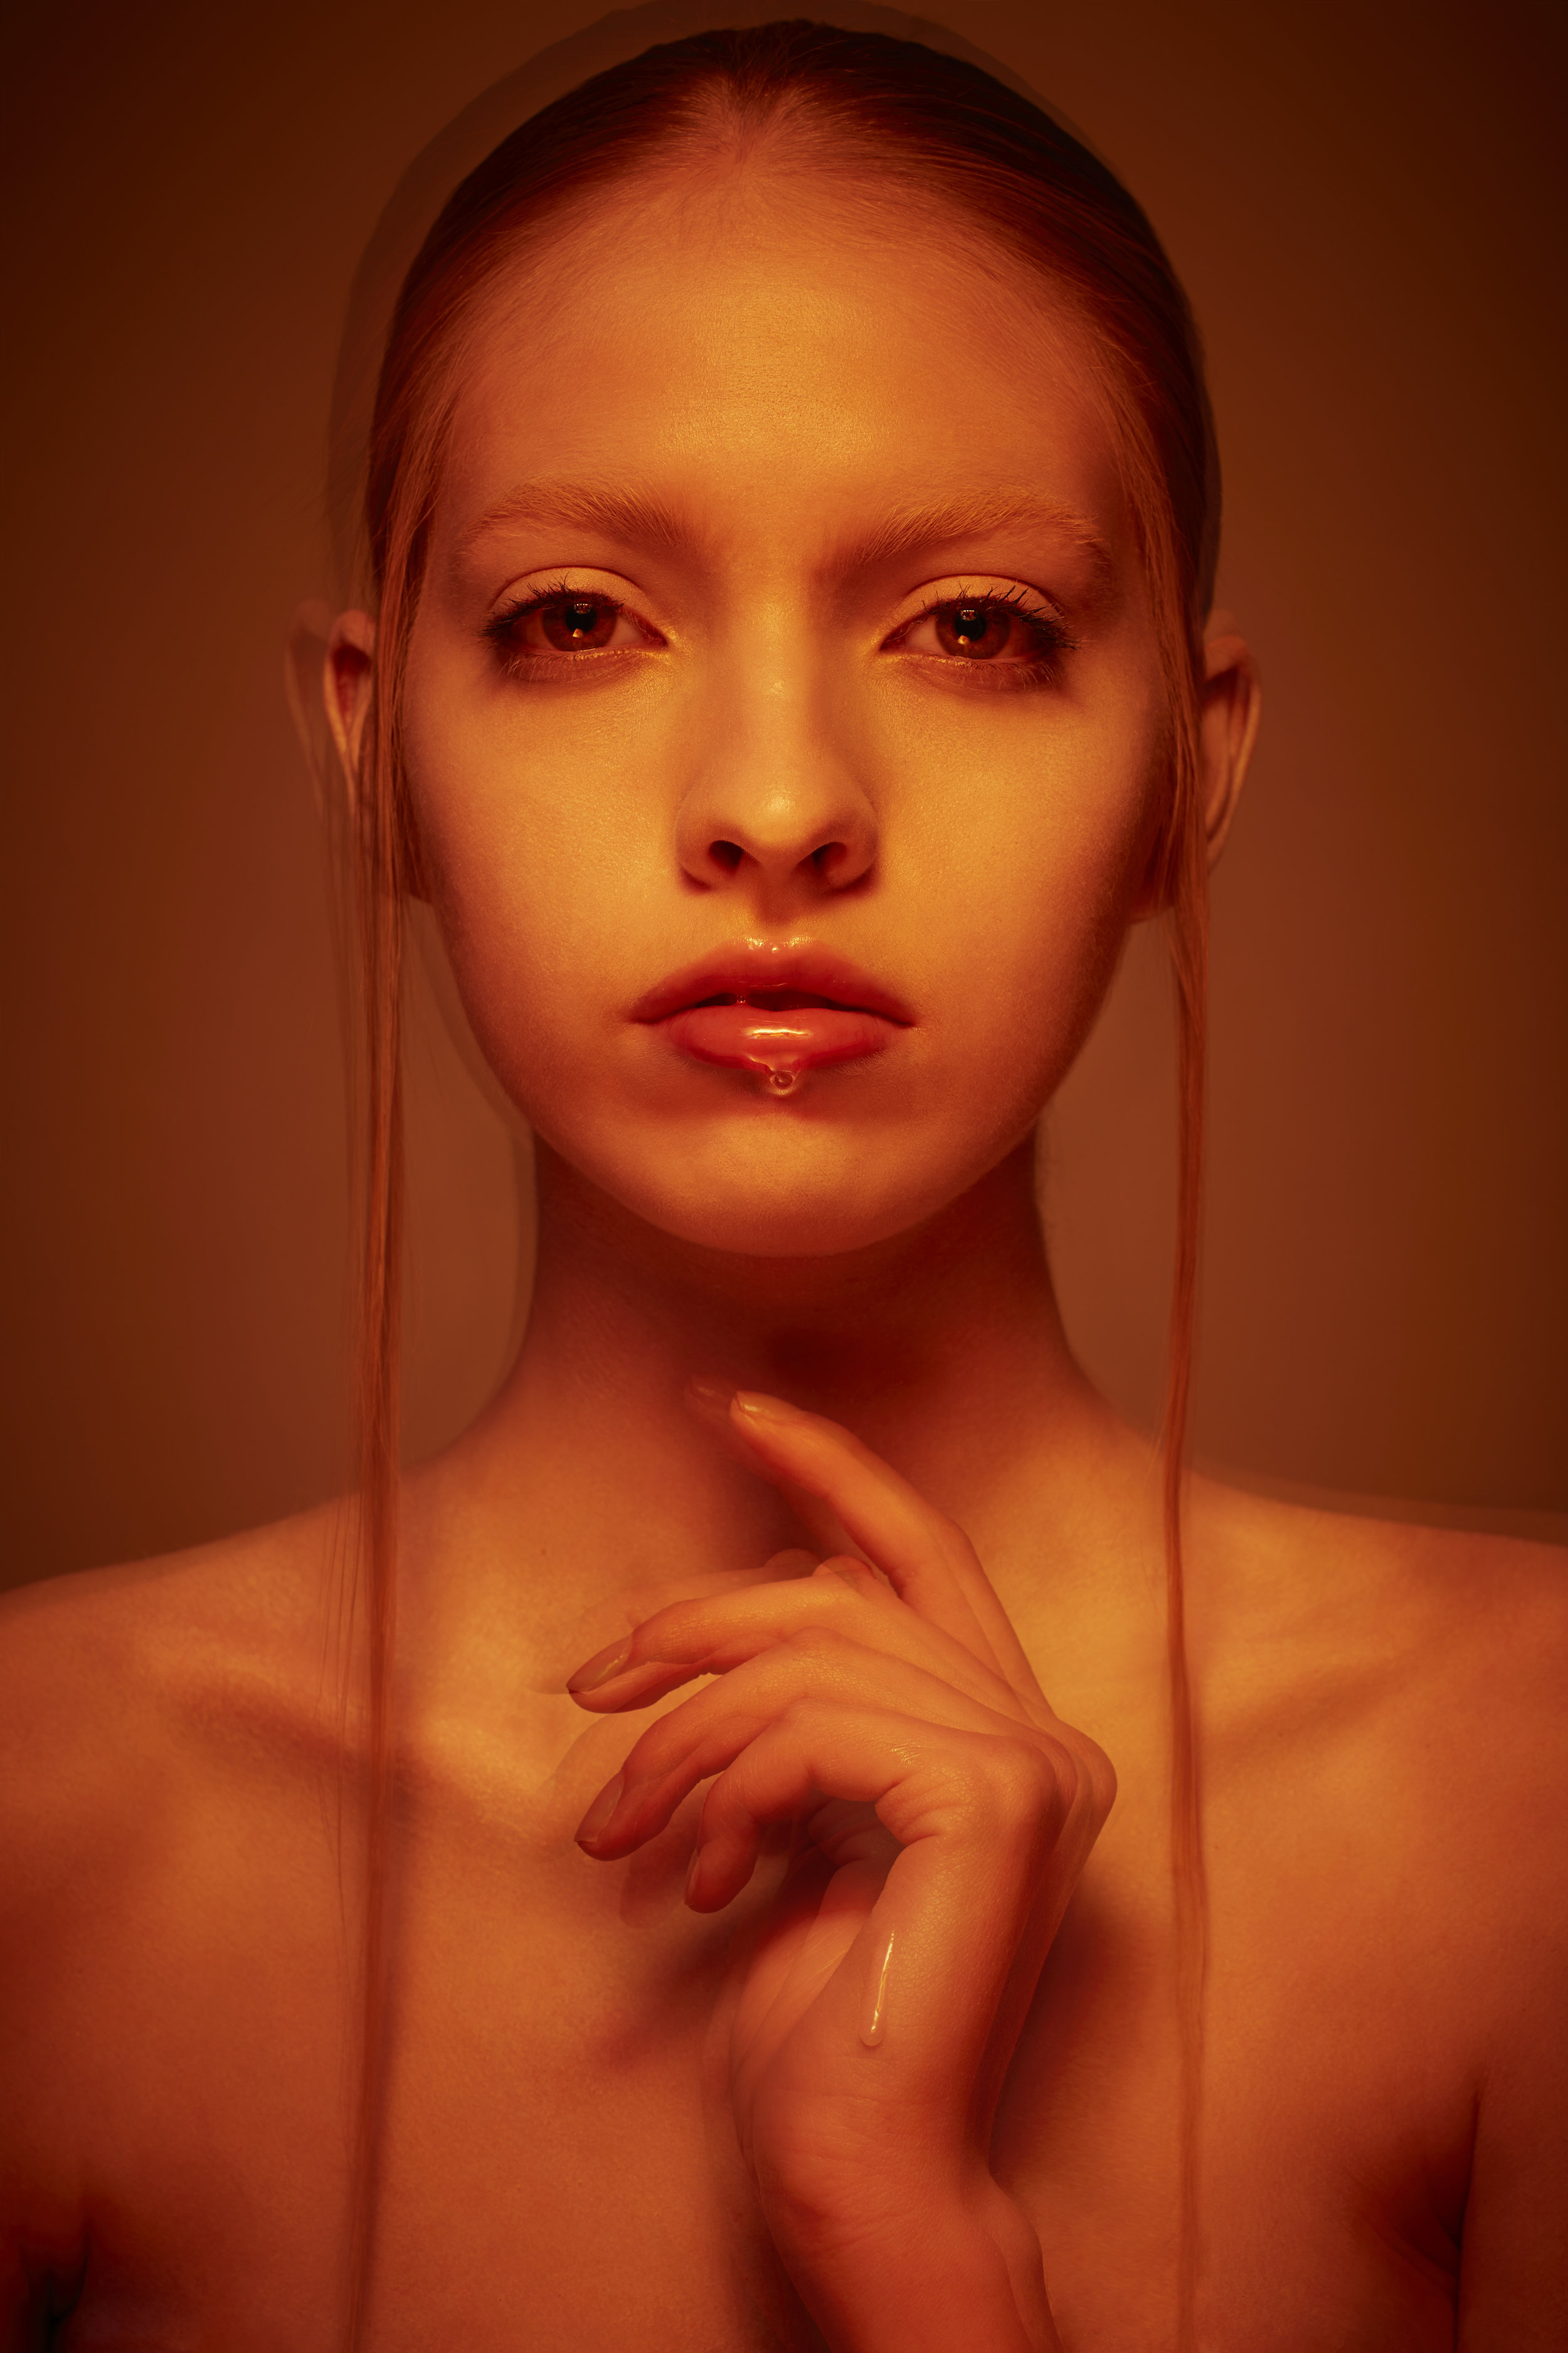 Model: Ale Velasco  Make Up Artist: Caitlin Wooters  Hair Stylist: Katya Zemtsova